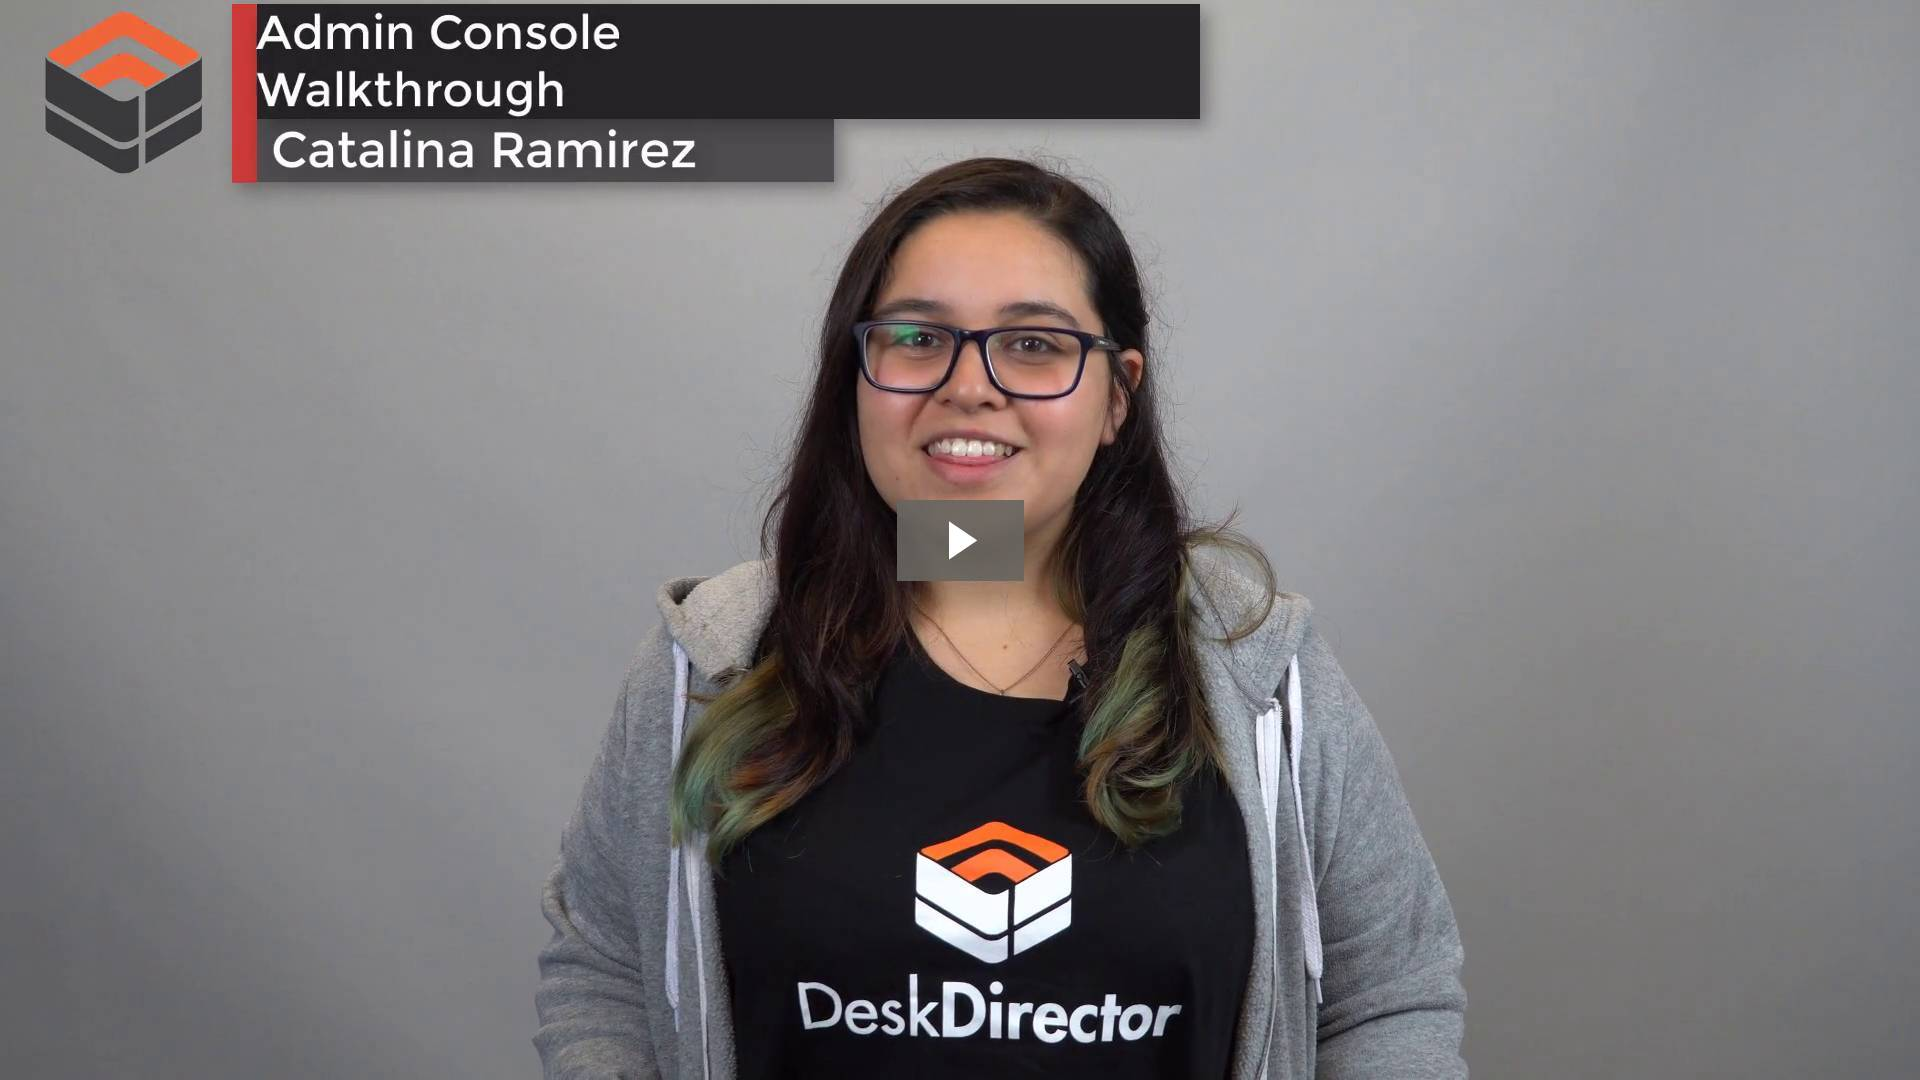 Admin Console Full Demo (September 2017)